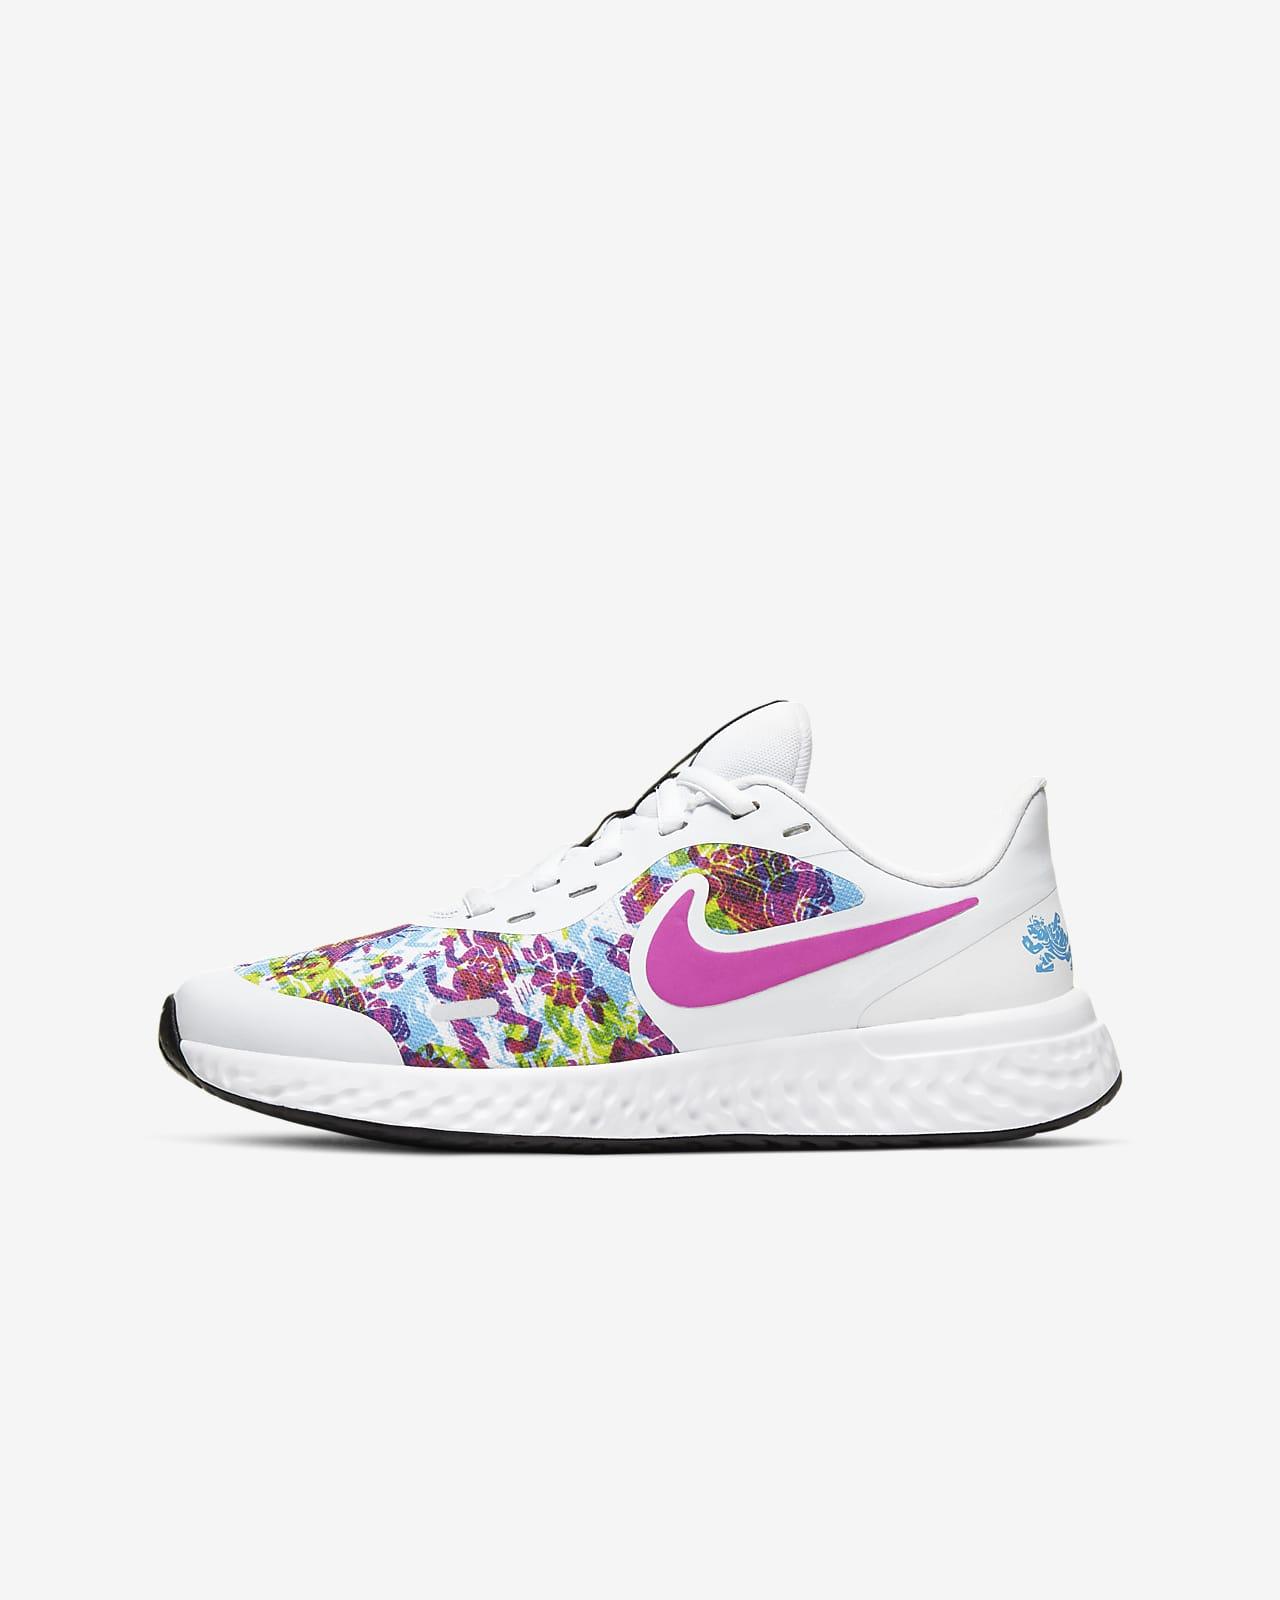 Calzado De Running Para Ninos Talla Grande Nike Revolution 5 Fable Nike Com